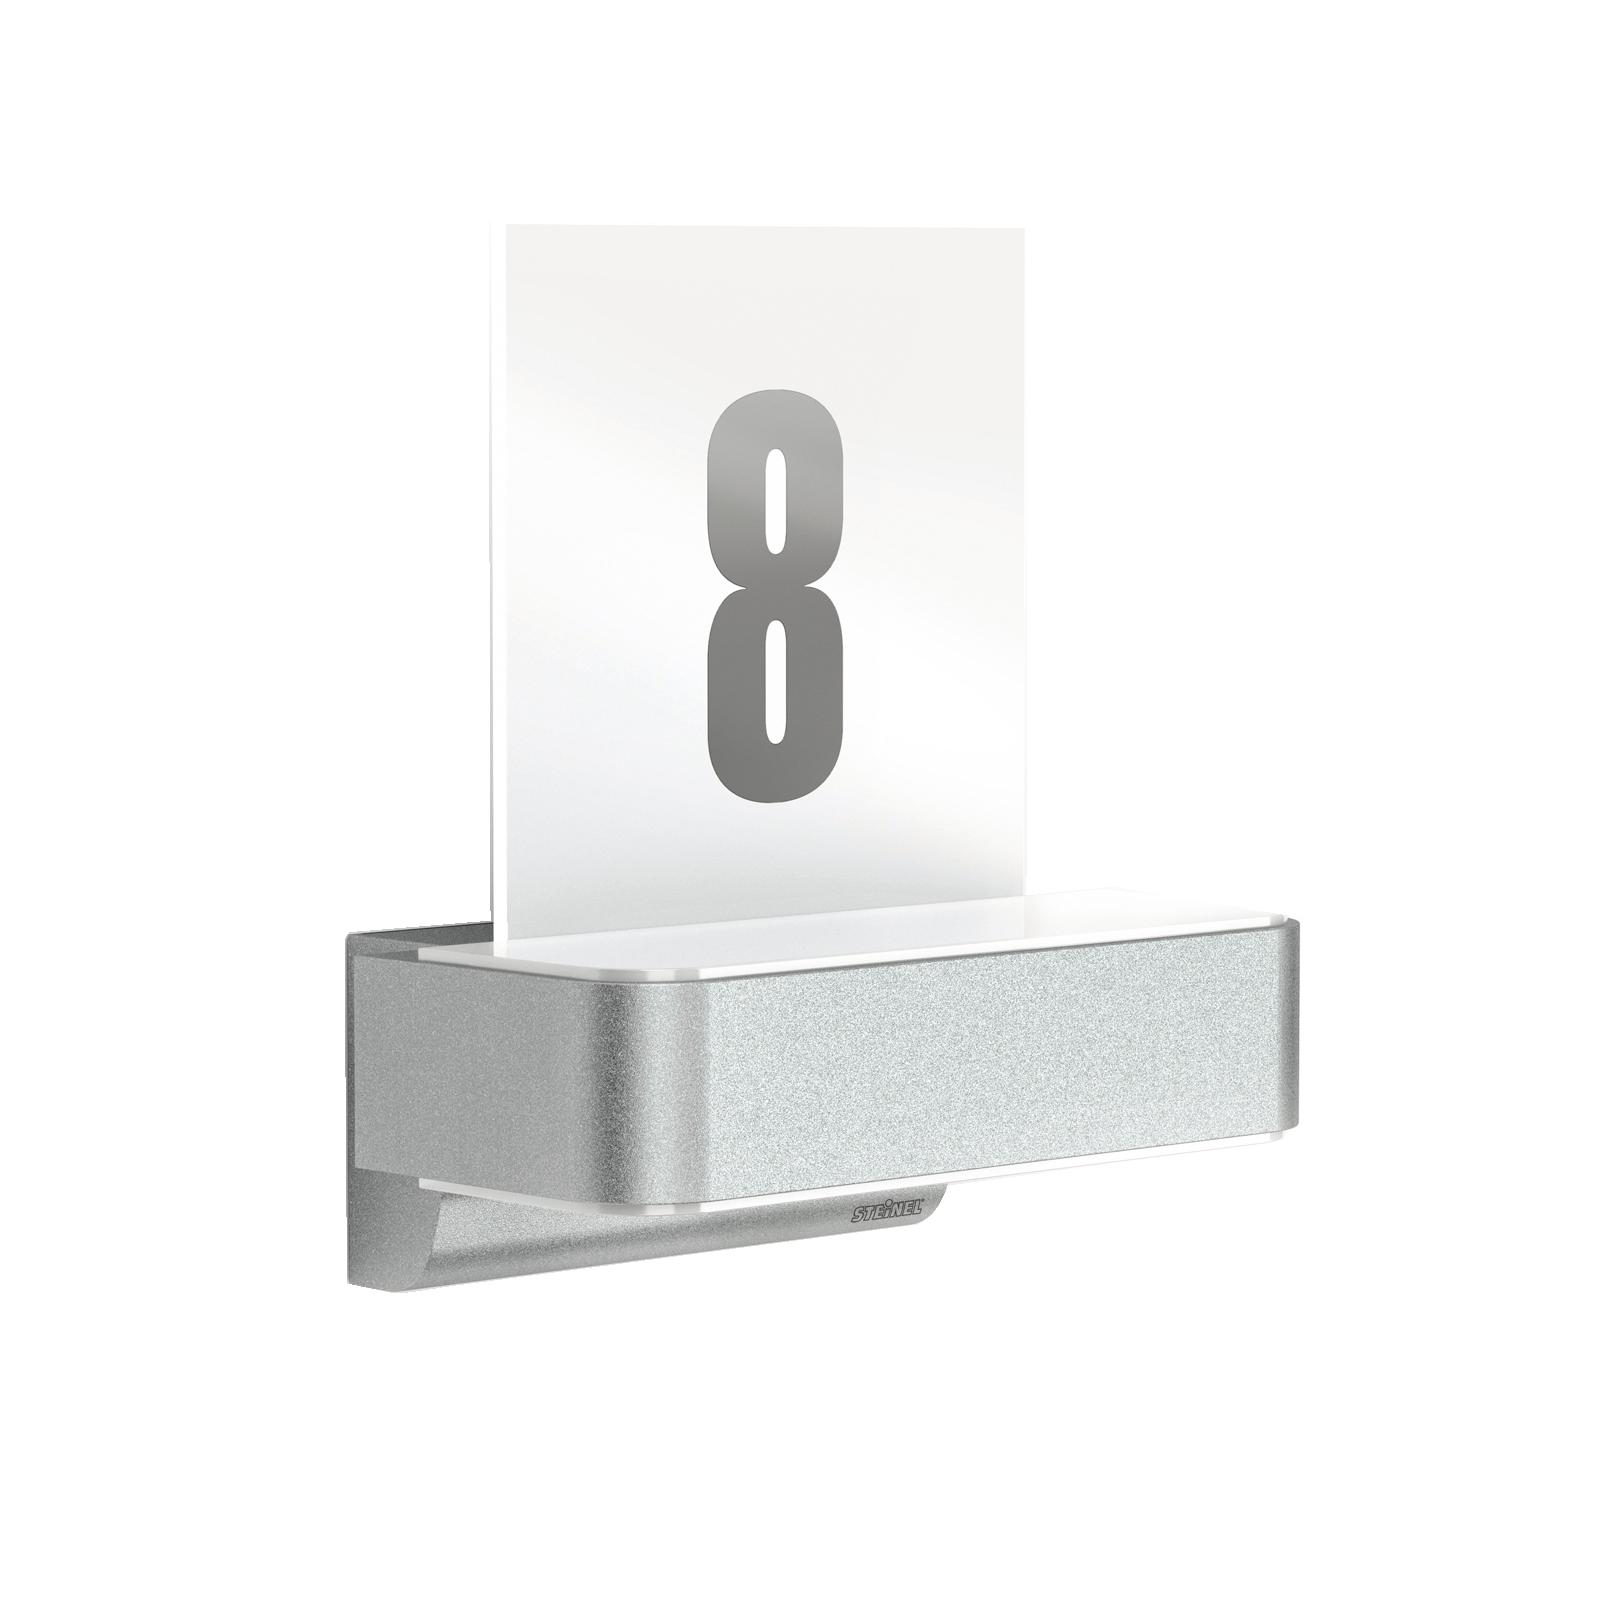 Steinel L 820 iHF Sensor-LED-Wandleuchte, Up-/Downlight + Hausnummern-Panel